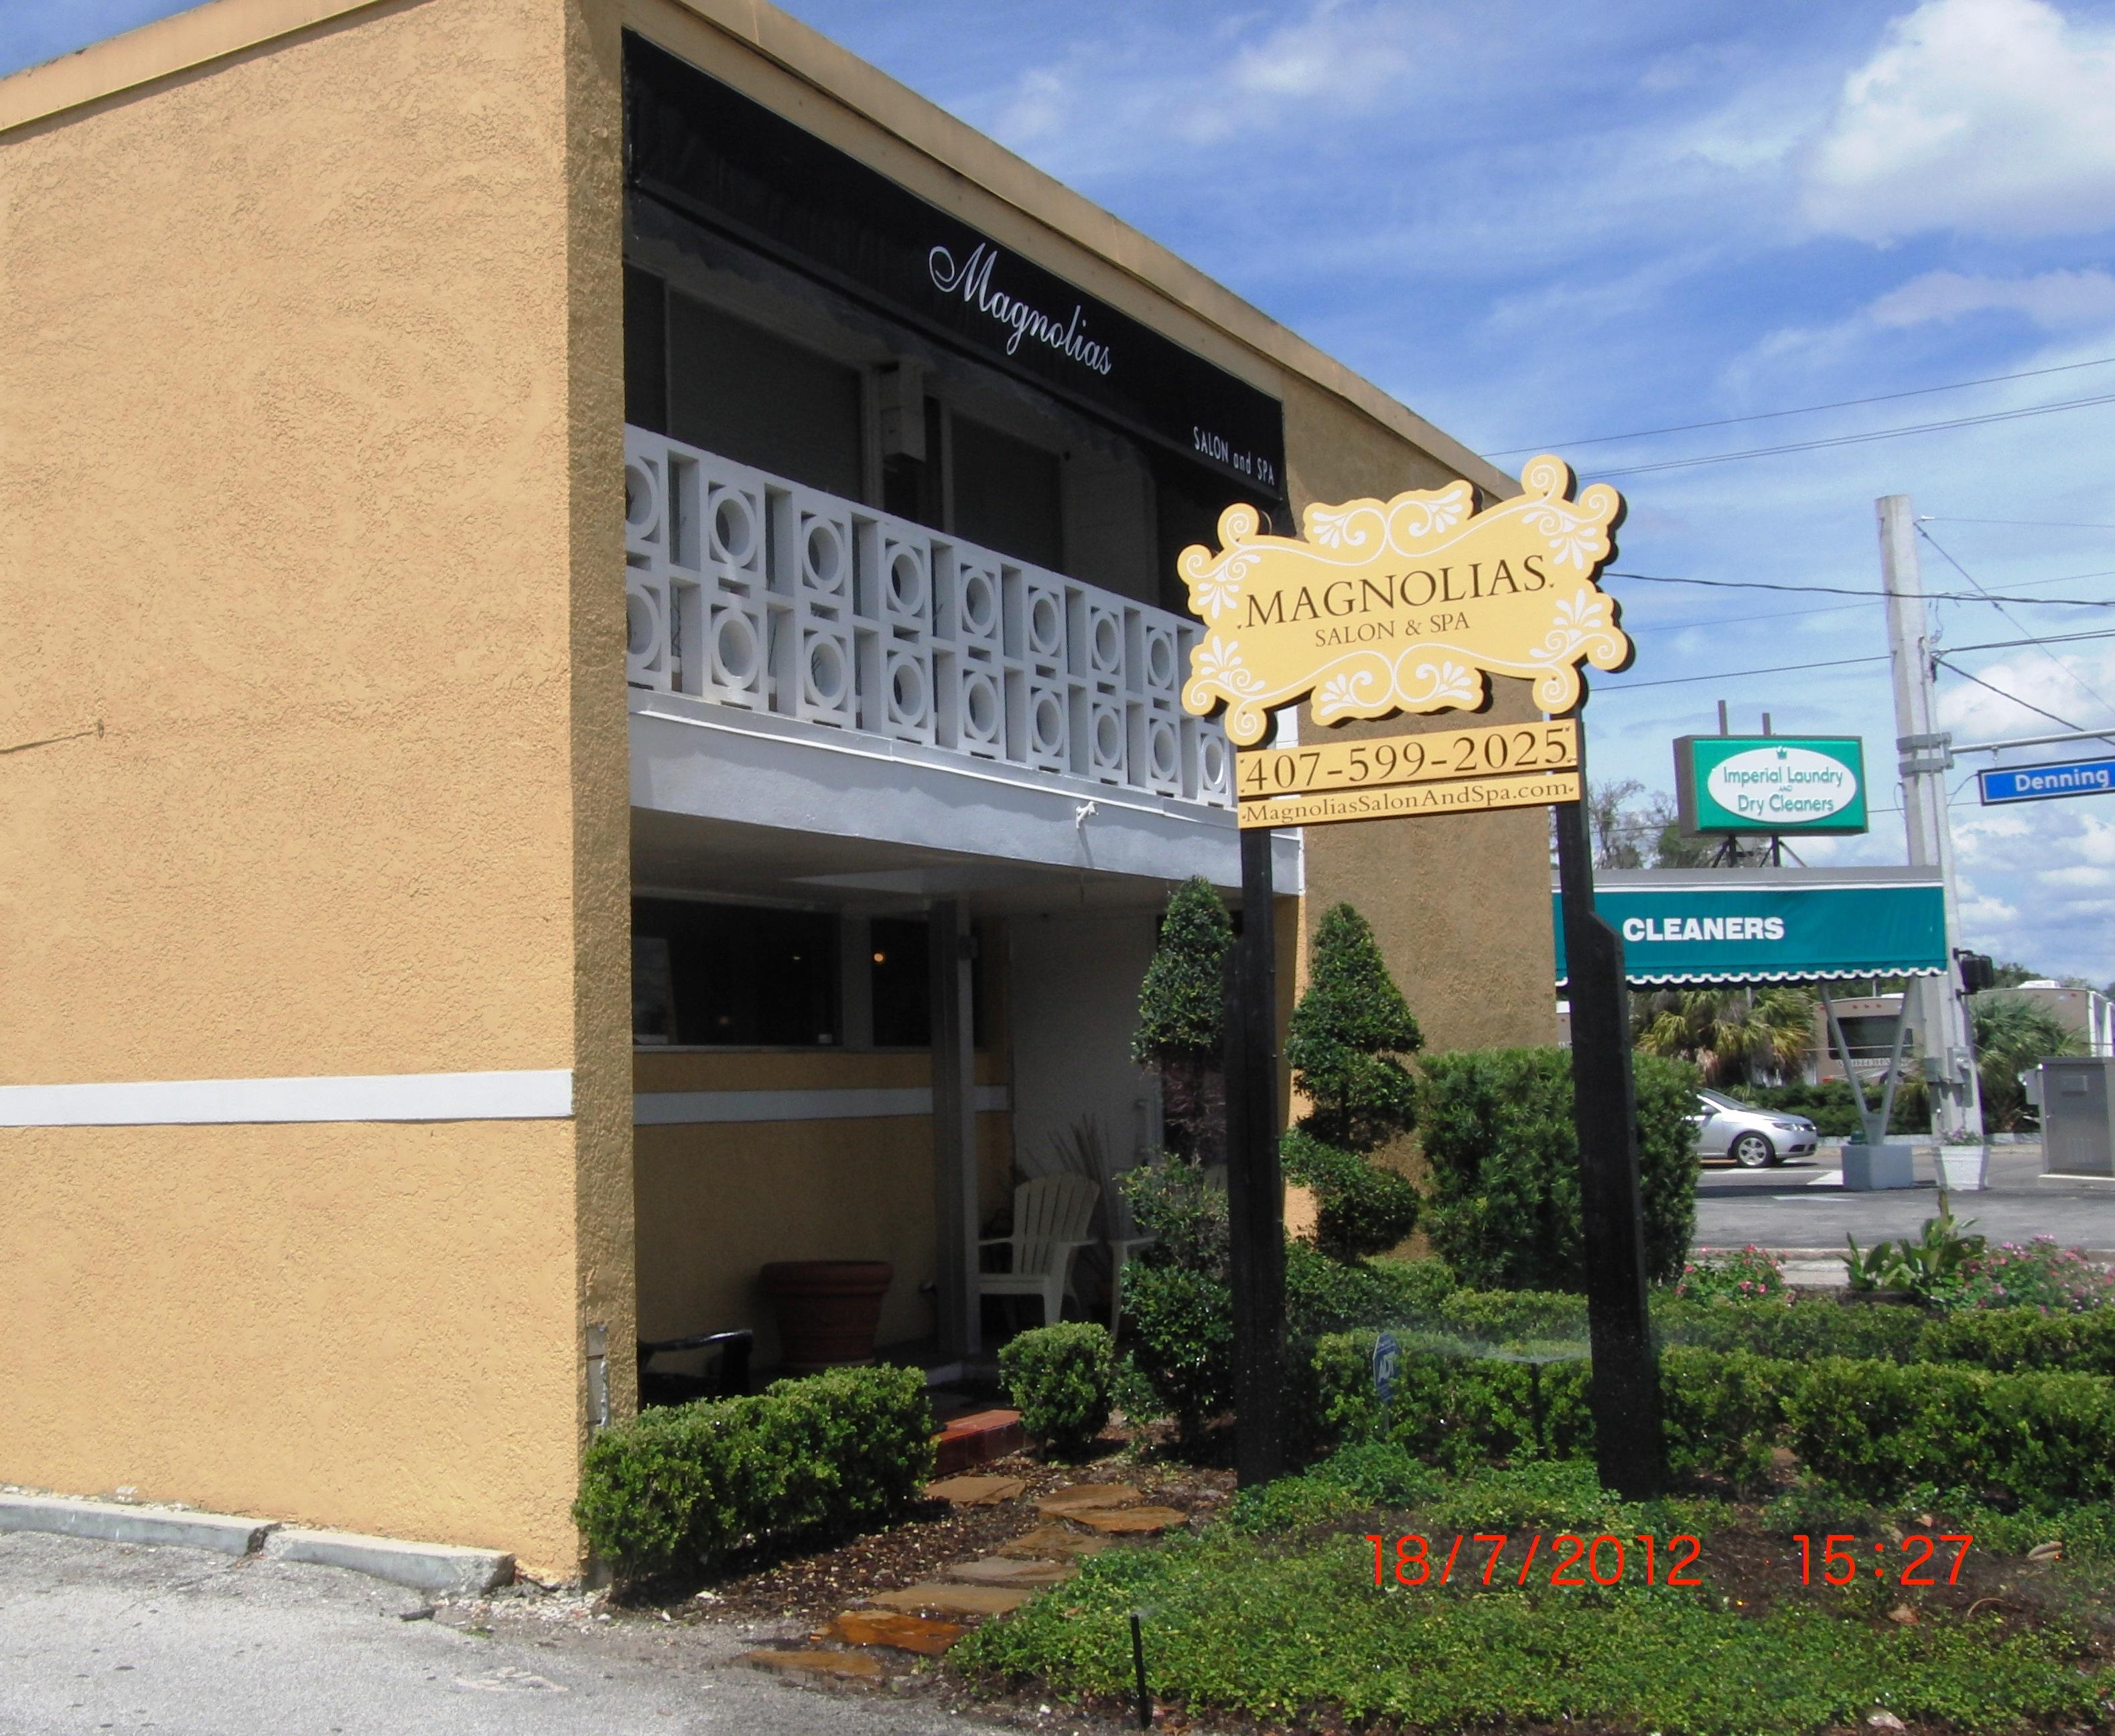 Magnolias Salon & Spa, Winter Park FL